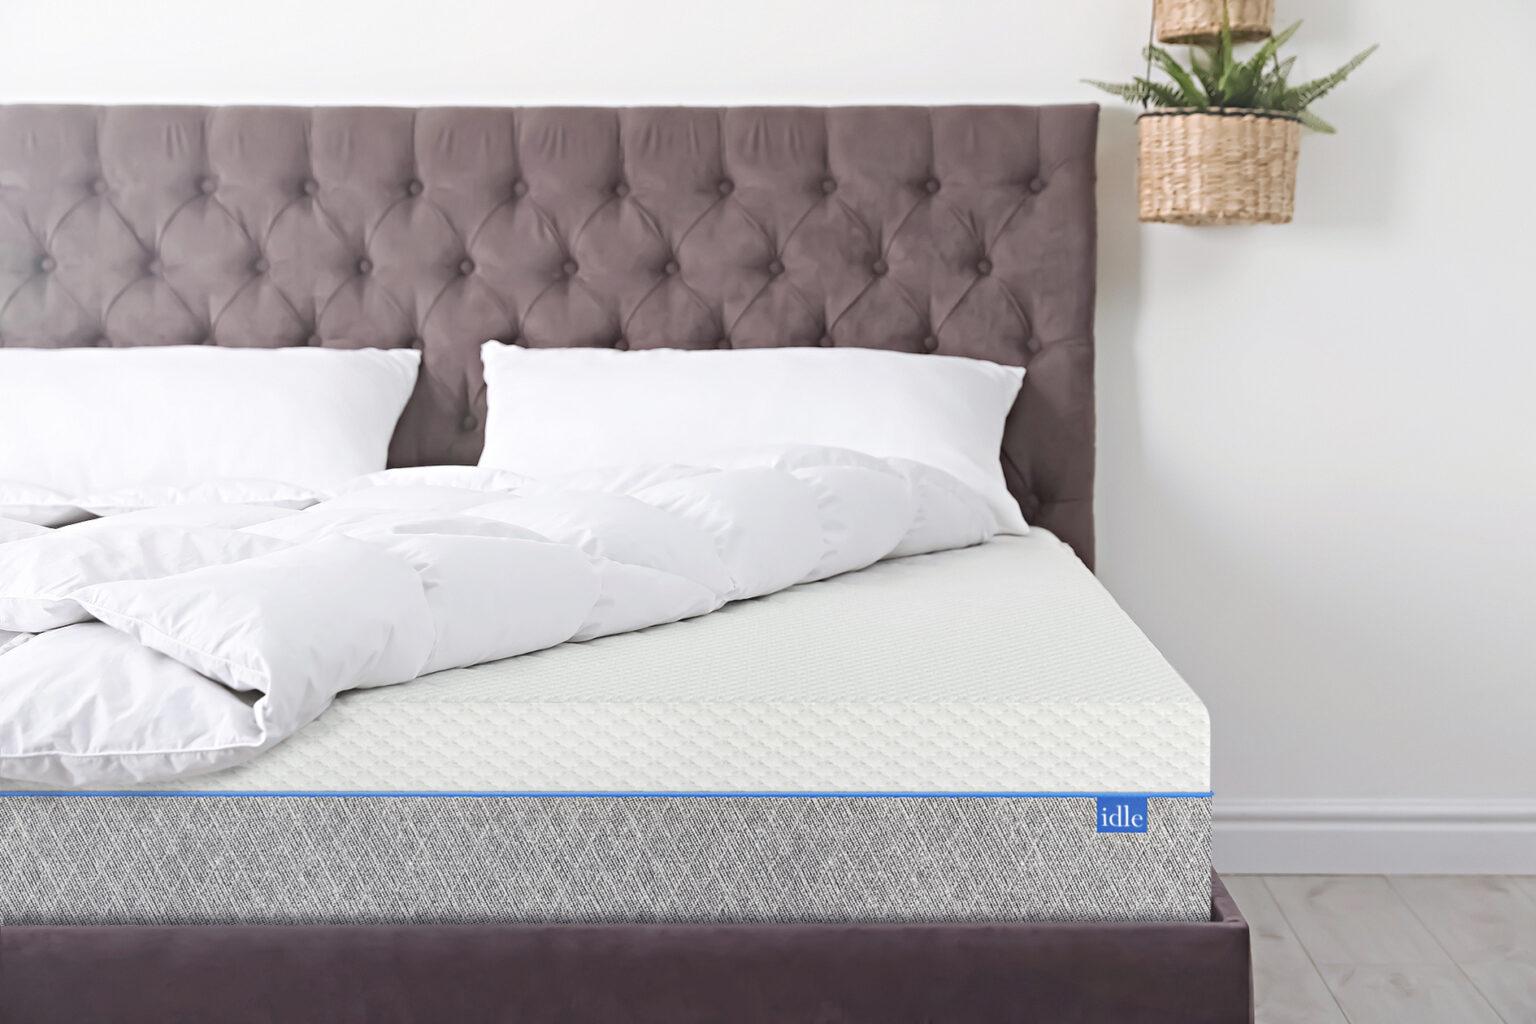 Idle new memory foam mattresses